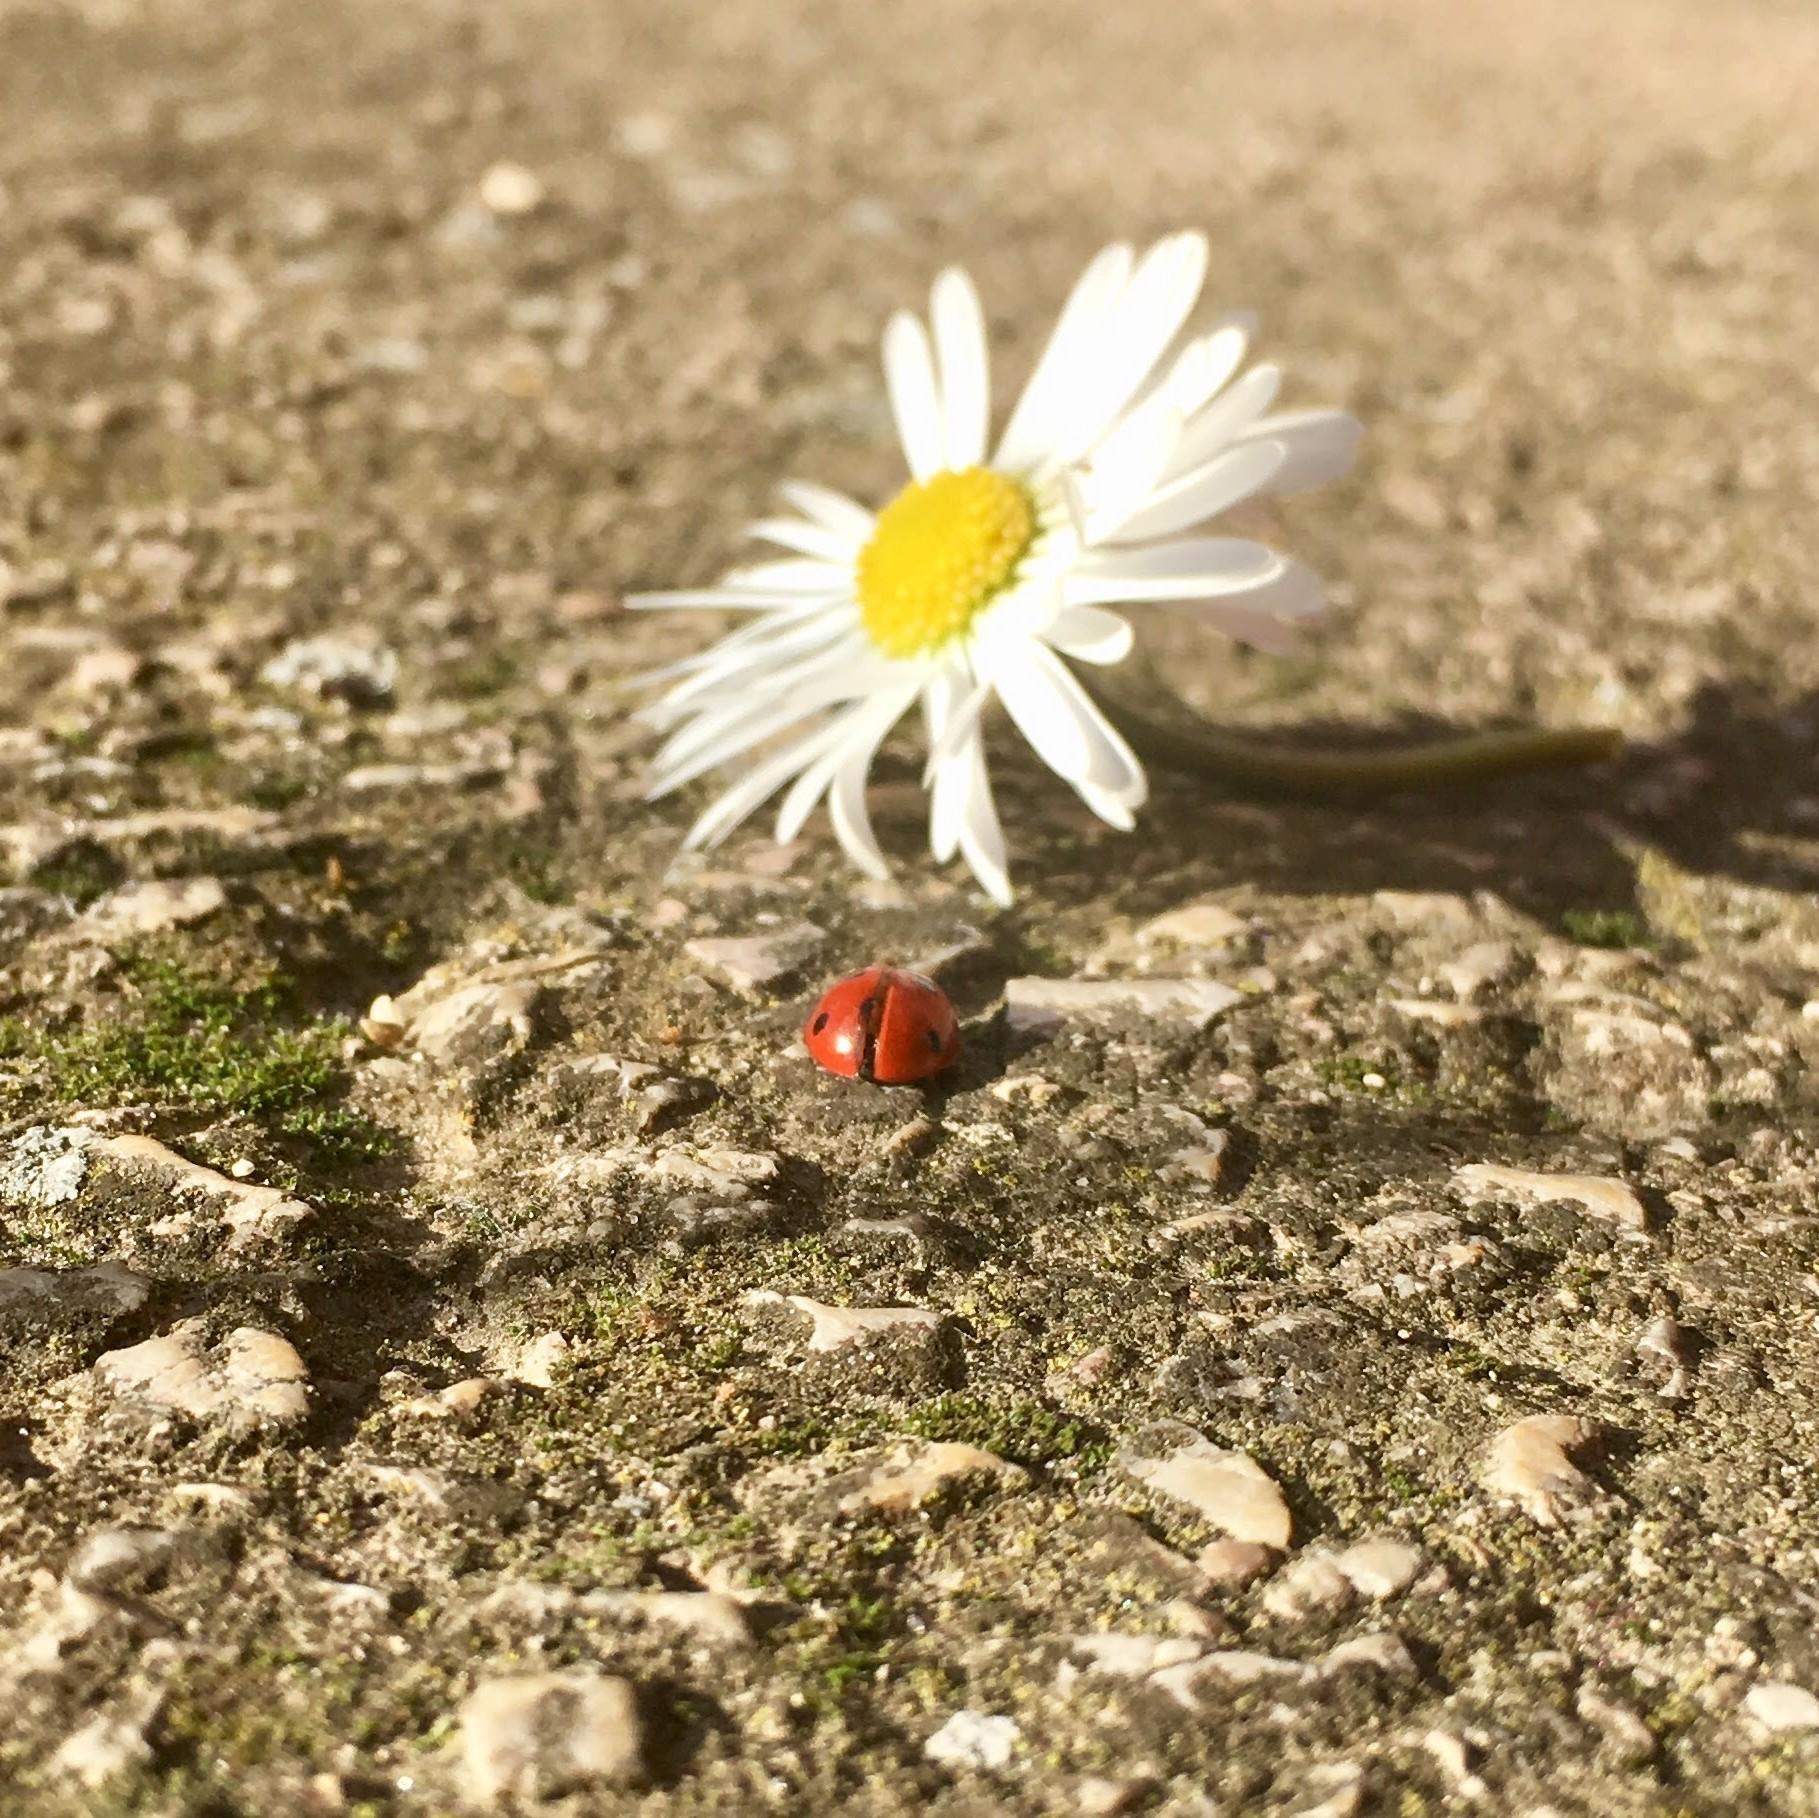 ladybug with flower